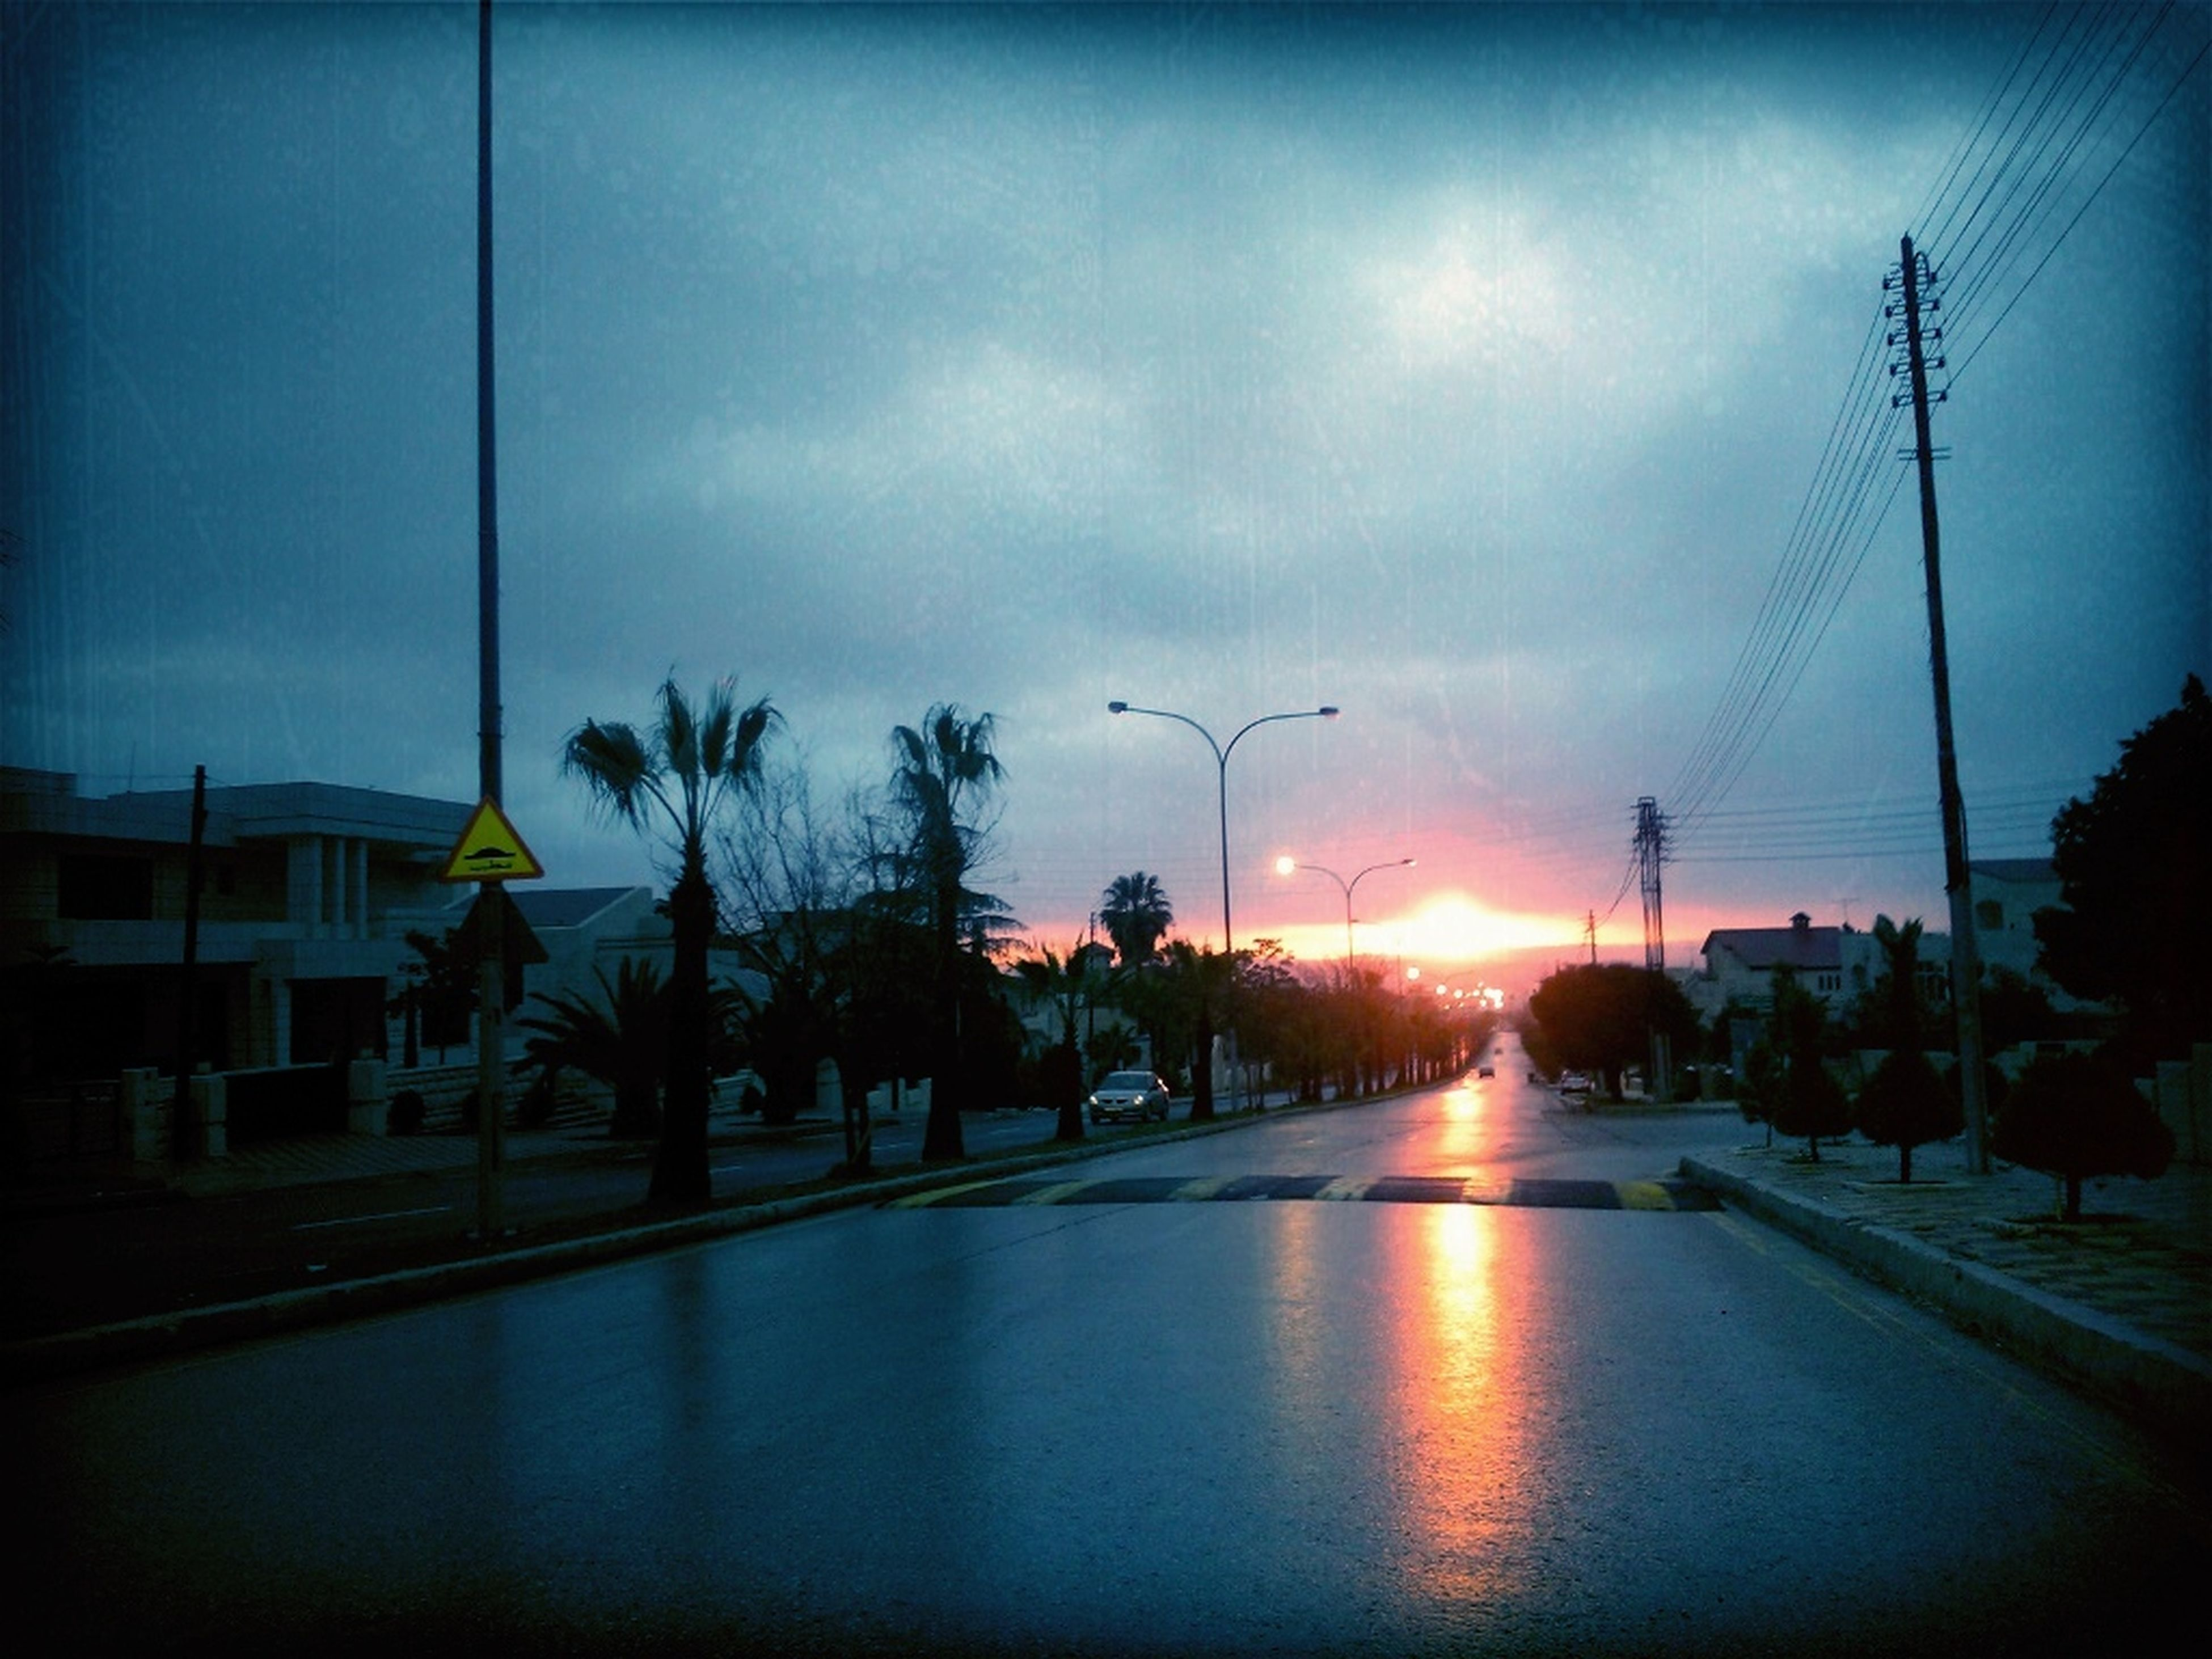 sunset, sky, building exterior, silhouette, built structure, street light, cloud - sky, street, architecture, transportation, road, sun, power line, car, cloud, city, sunlight, outdoors, tree, electricity pylon